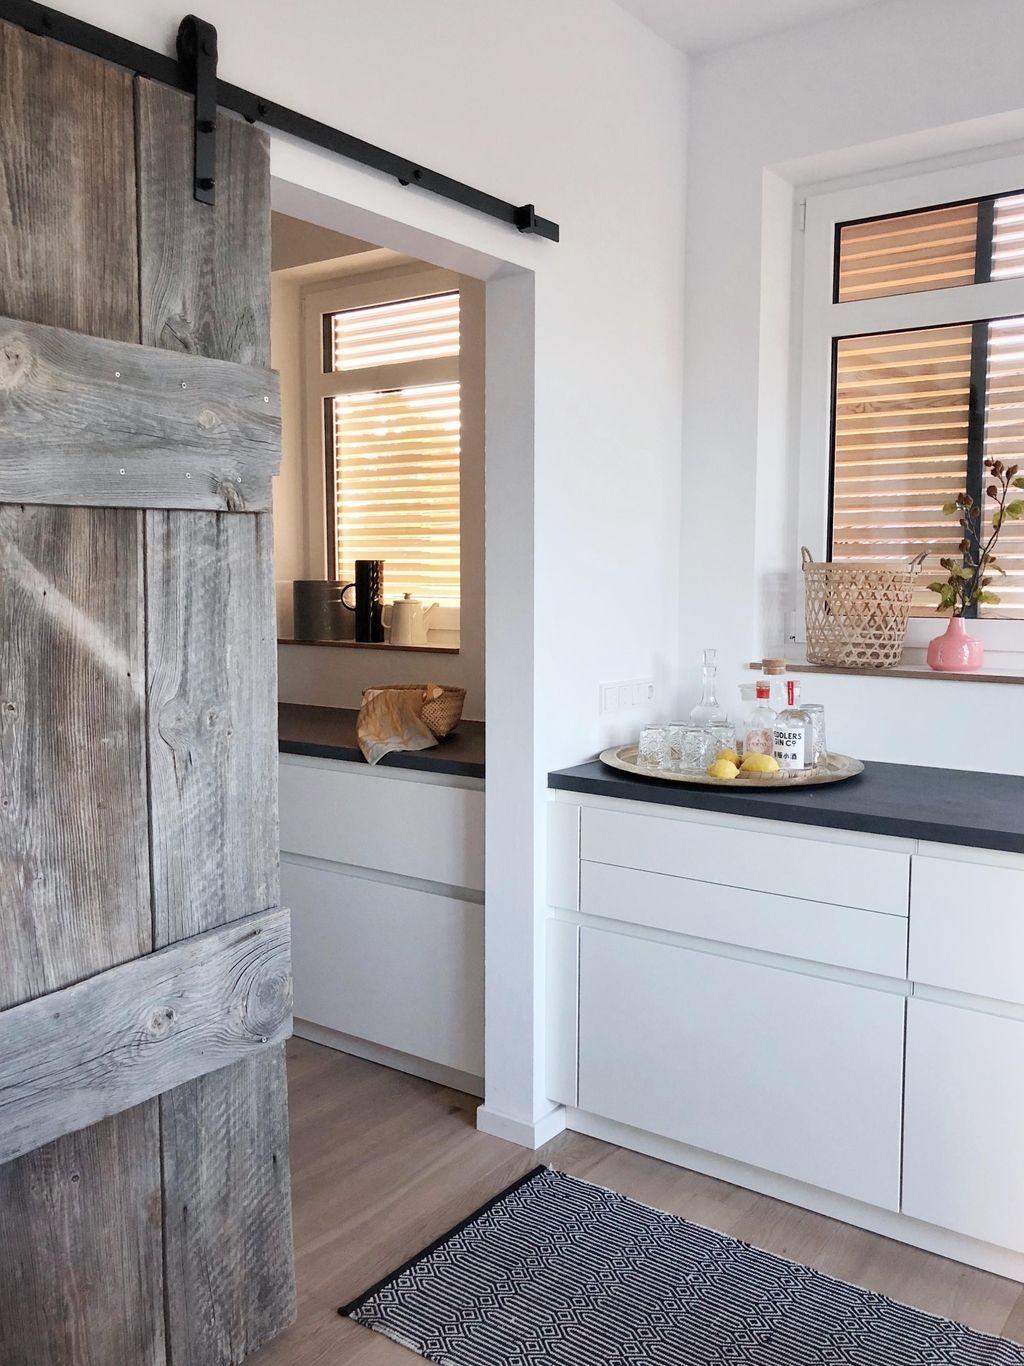 Our kitchen # kitchen # kitchen # whitehome # pantry # ... ,  #homediyorganizationsbathroom #kitchen #pantry #whitehome